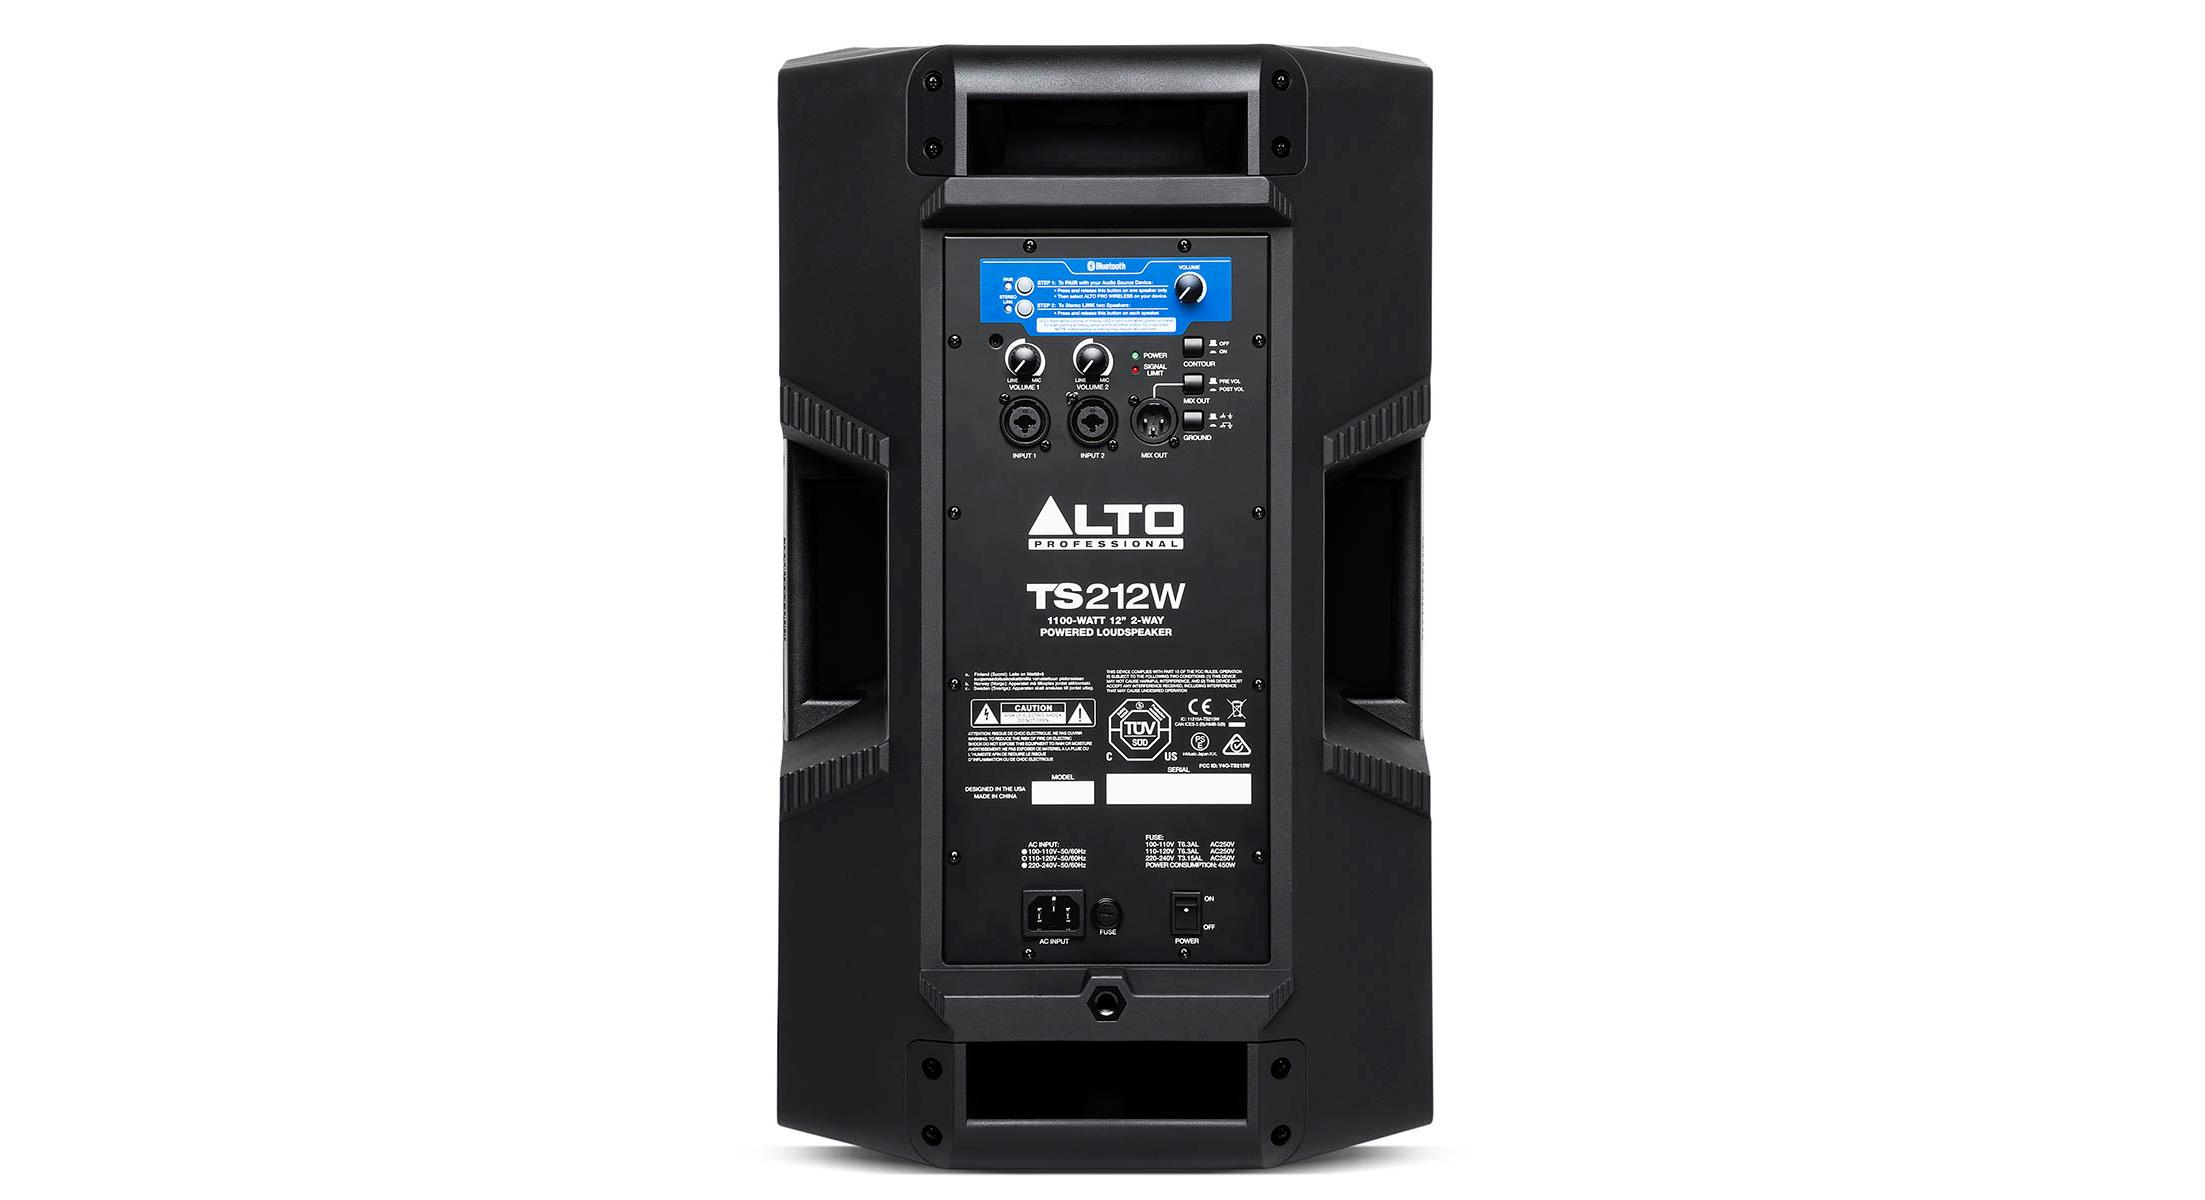 Alto-TS212W-back.jpg